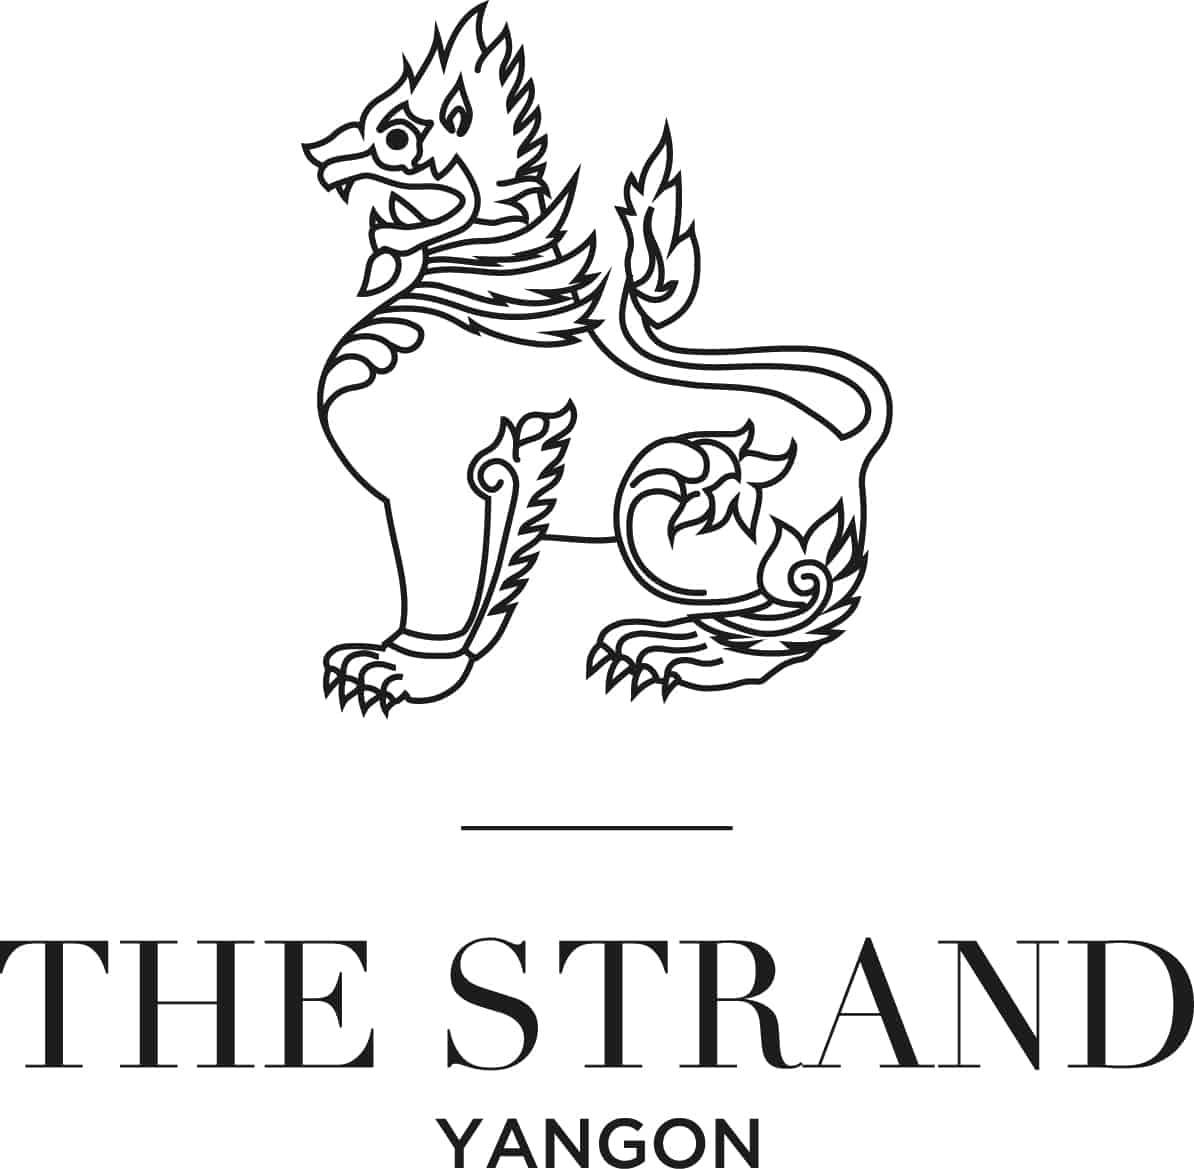 The Strand Hotel Yangon logo